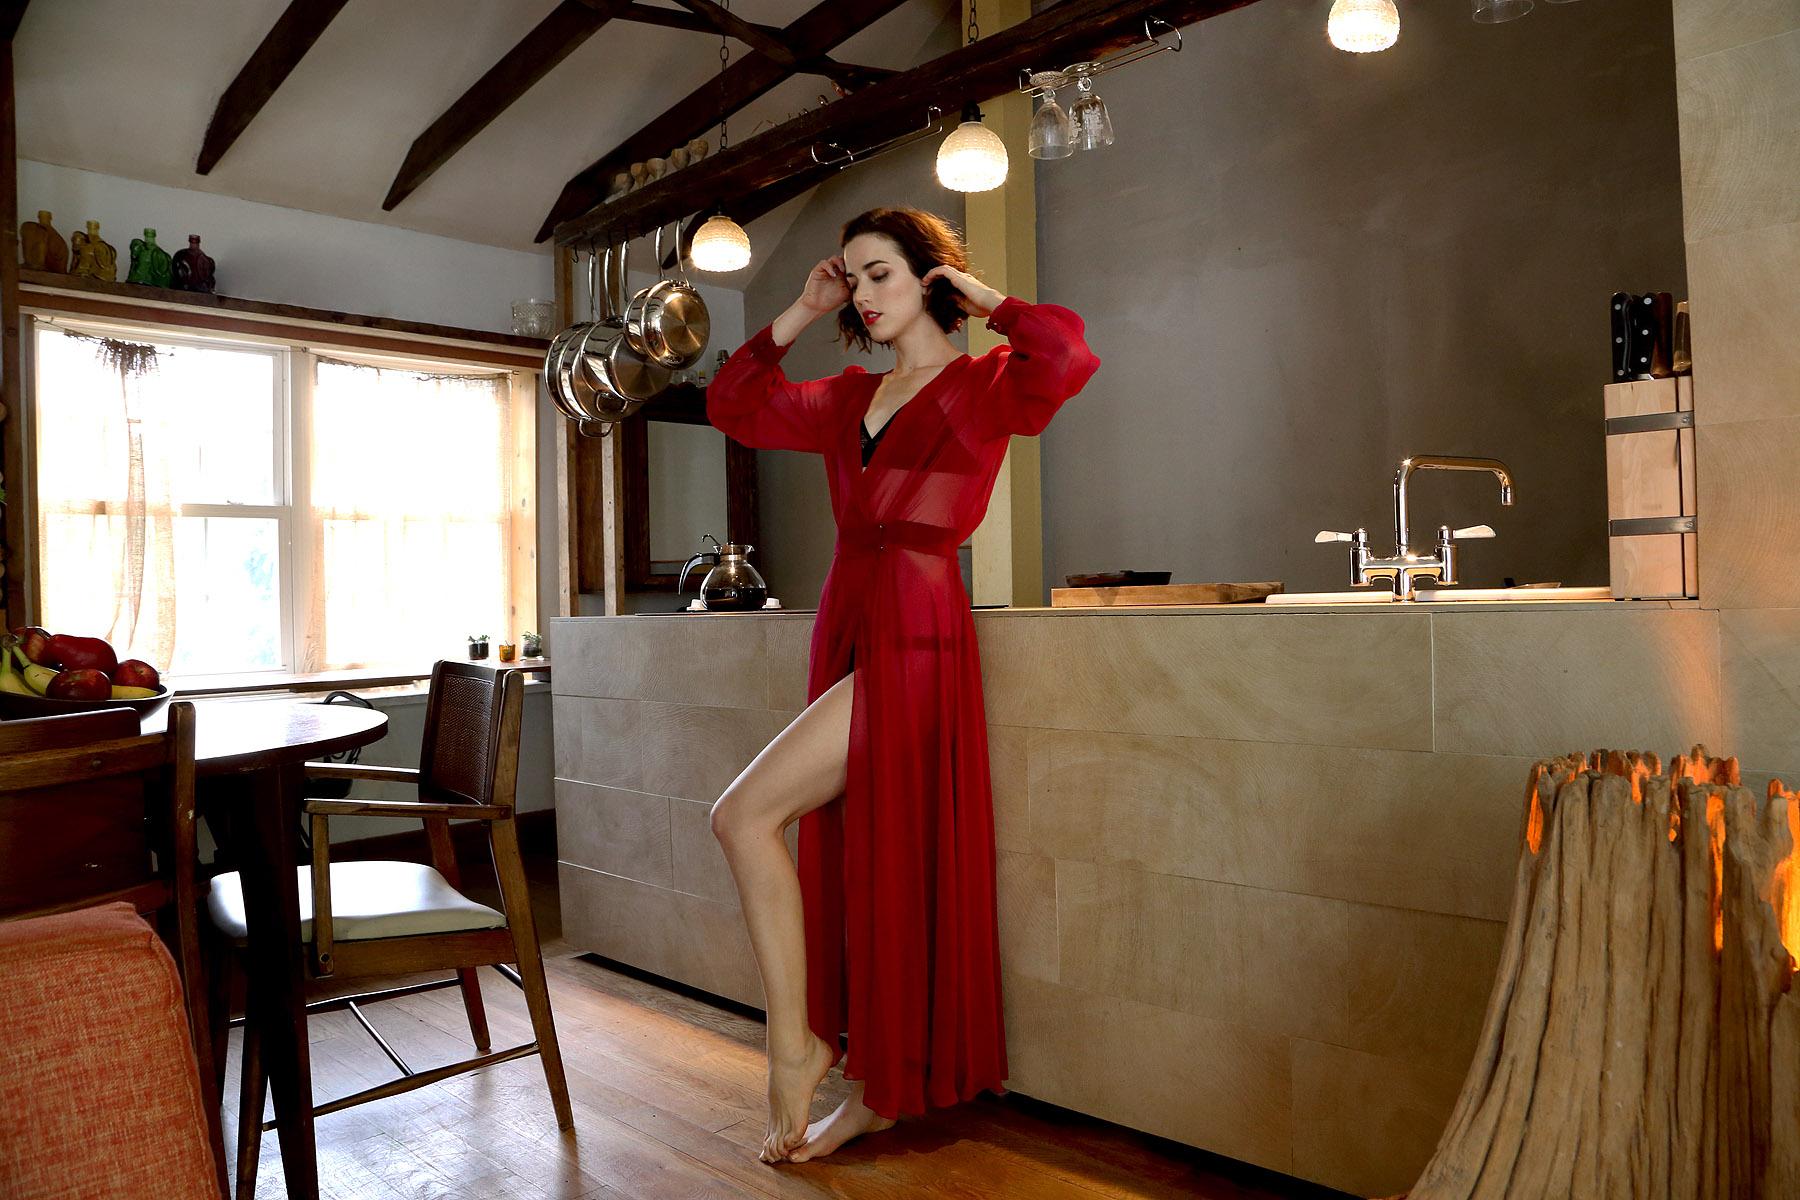 holiday-14-bts-lingerie-lookbook-red-sheer-romance-robe-cabin-2.jpg